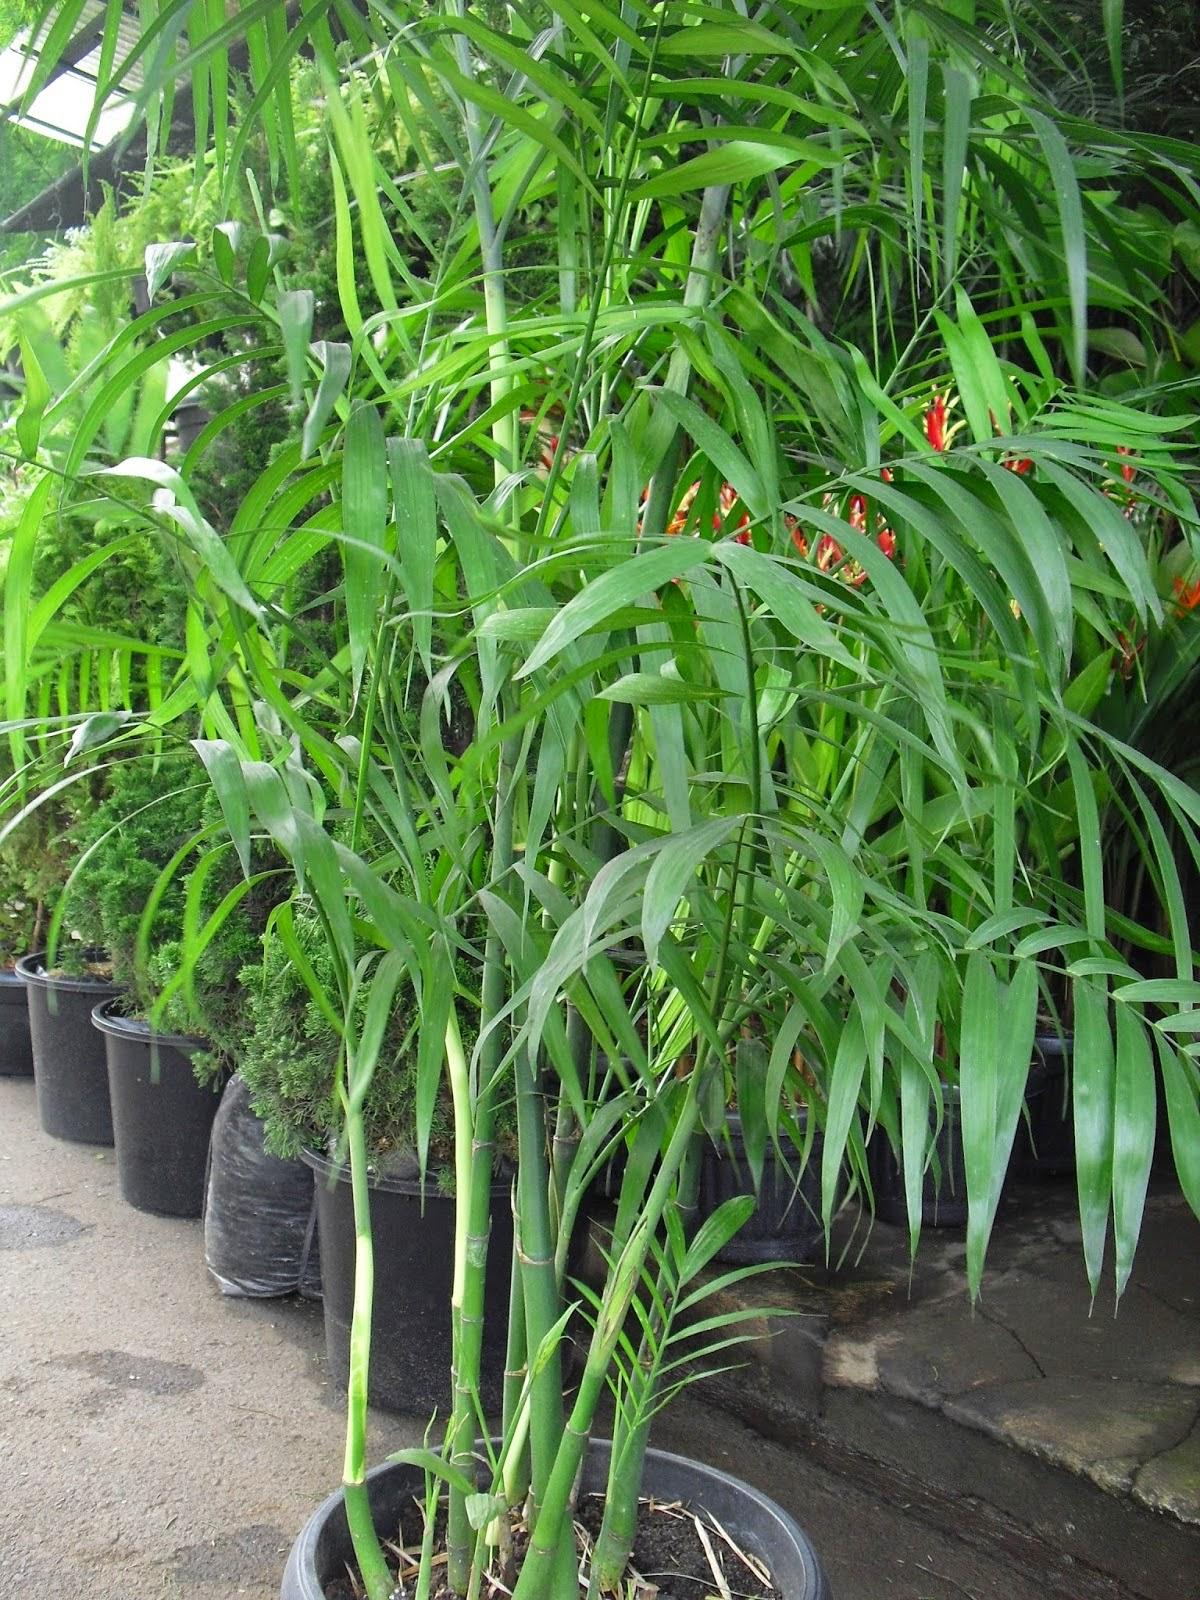 Jual pohon palm komodoria | suplier tanaman | tanaman hias | jasa desain taman